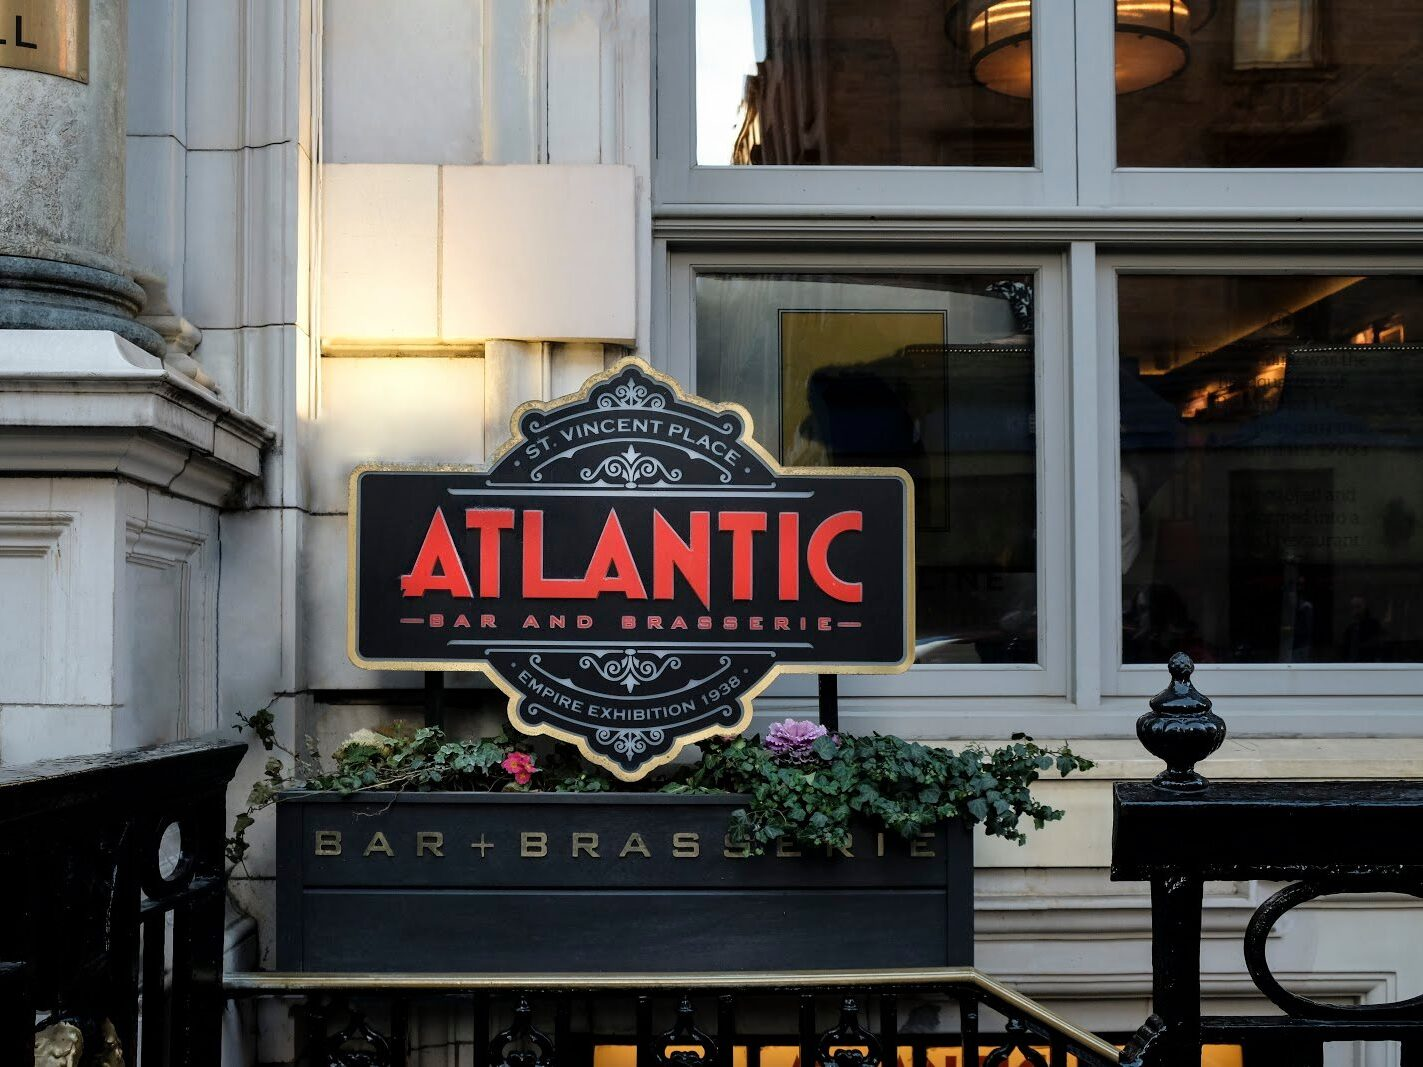 Atlantic Bar & Brasserie Glasgow City Centre